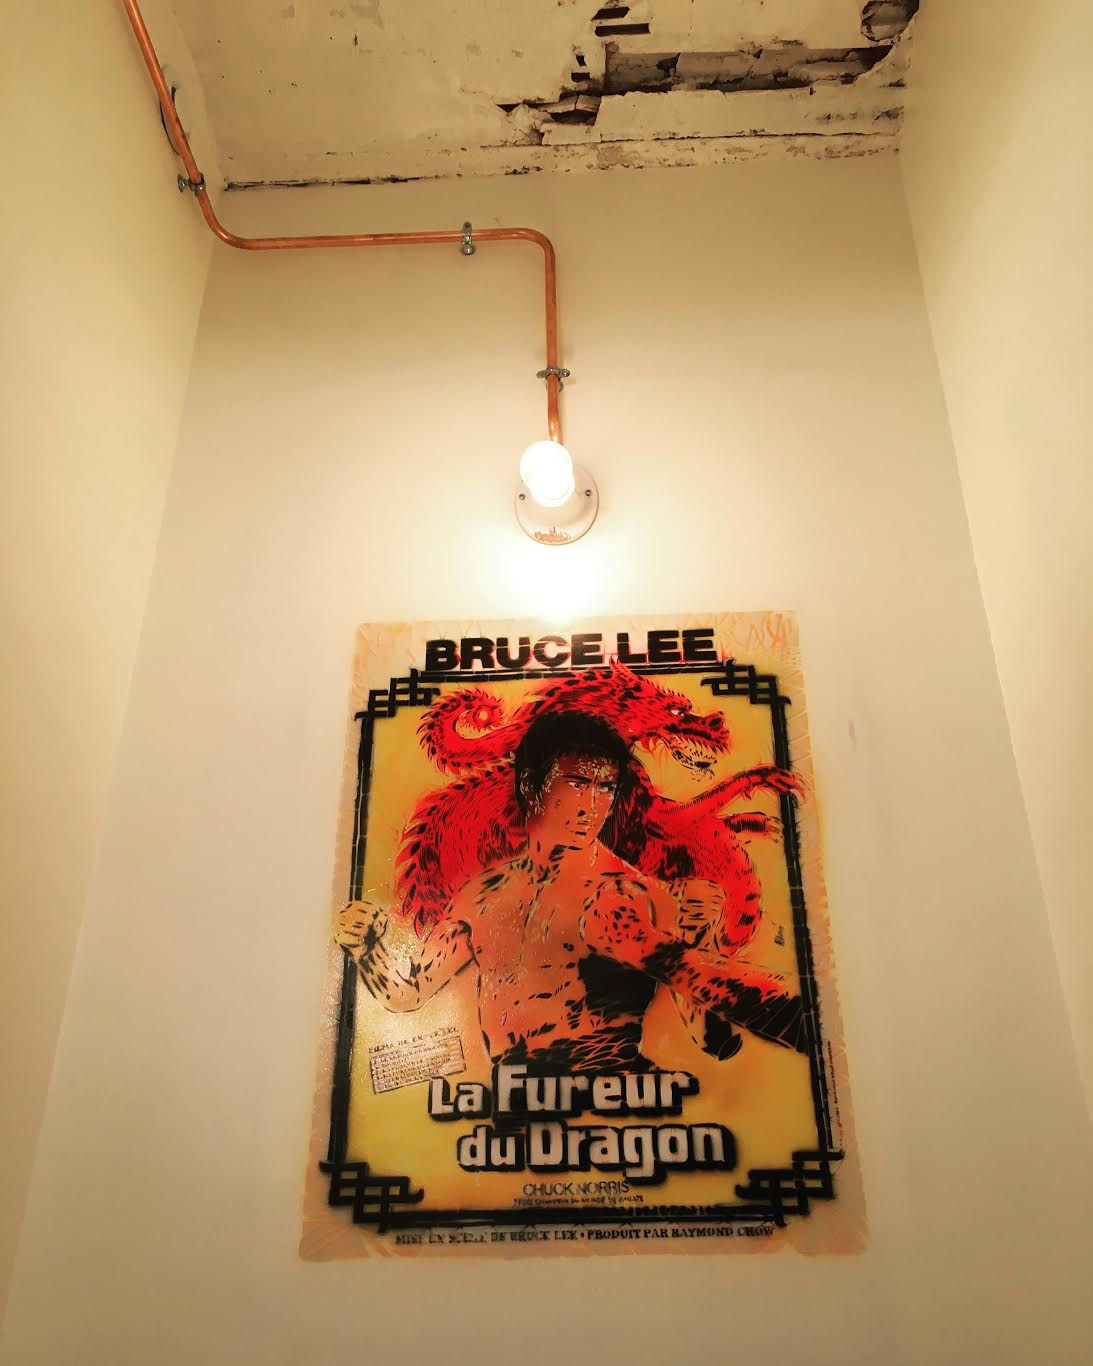 Bruce Lee par Artiste Ouvrier